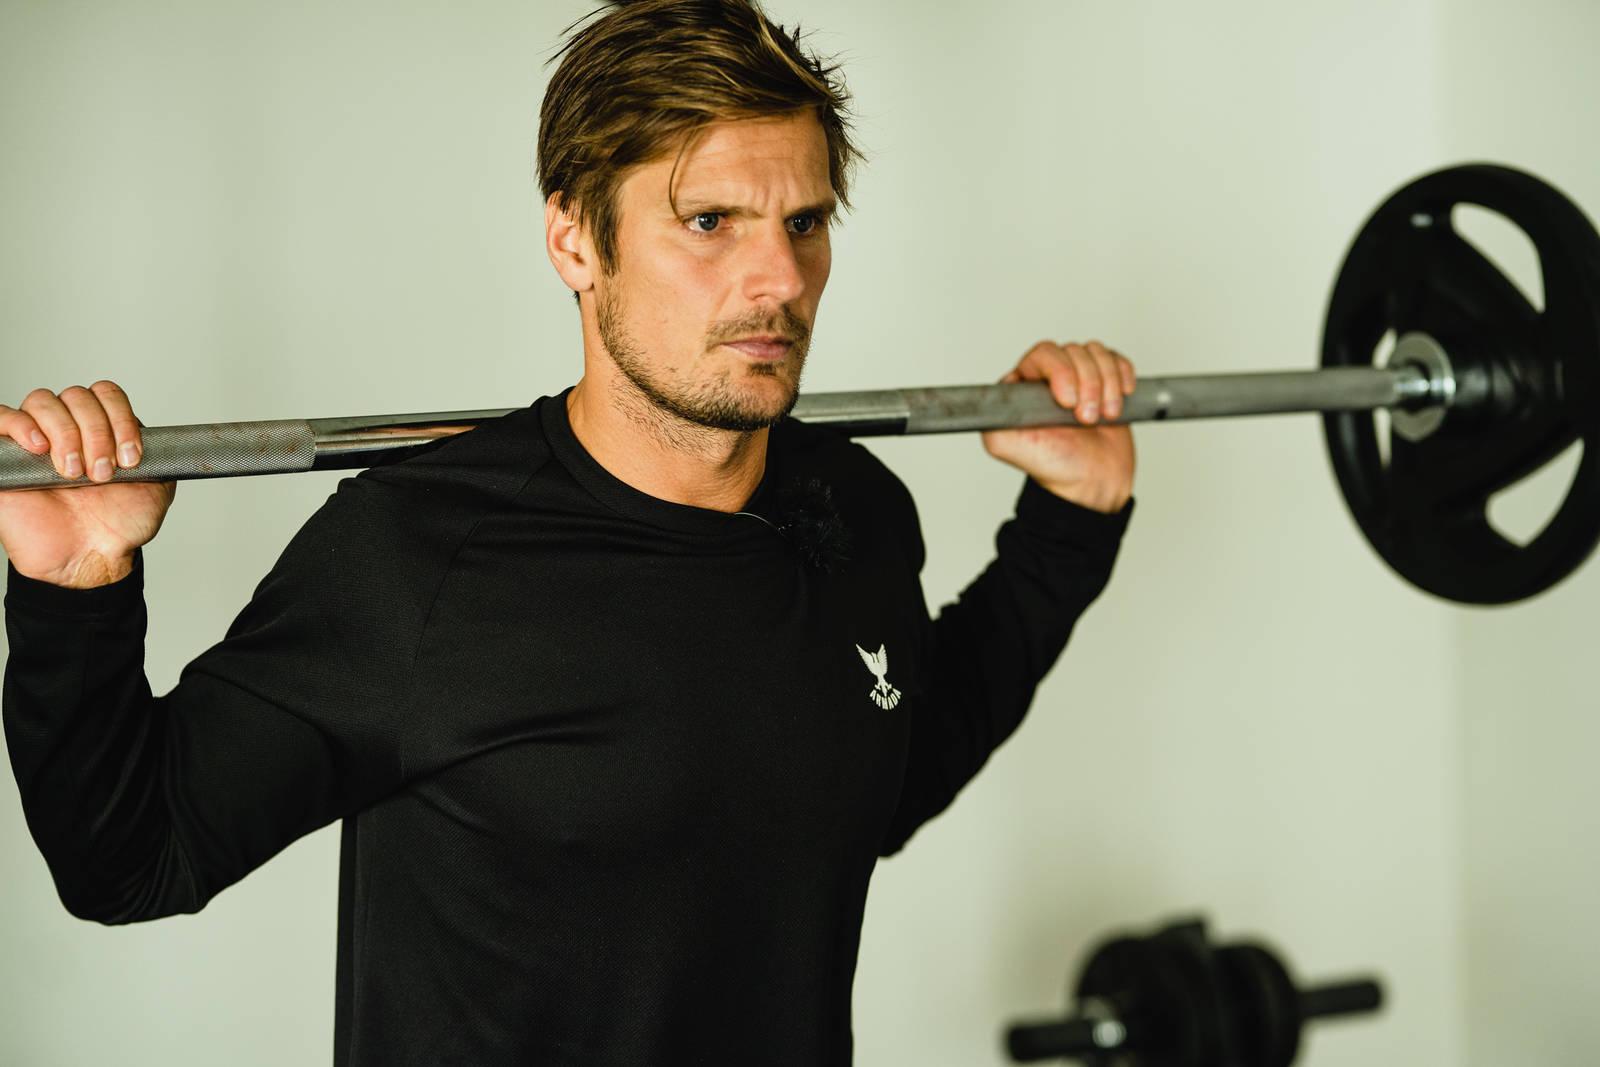 Styrketrening er ikke nødvendigvis ensbetydende med muskelbygging, ifølge Lars Haugvad. Bilde: Christian Nerdrum